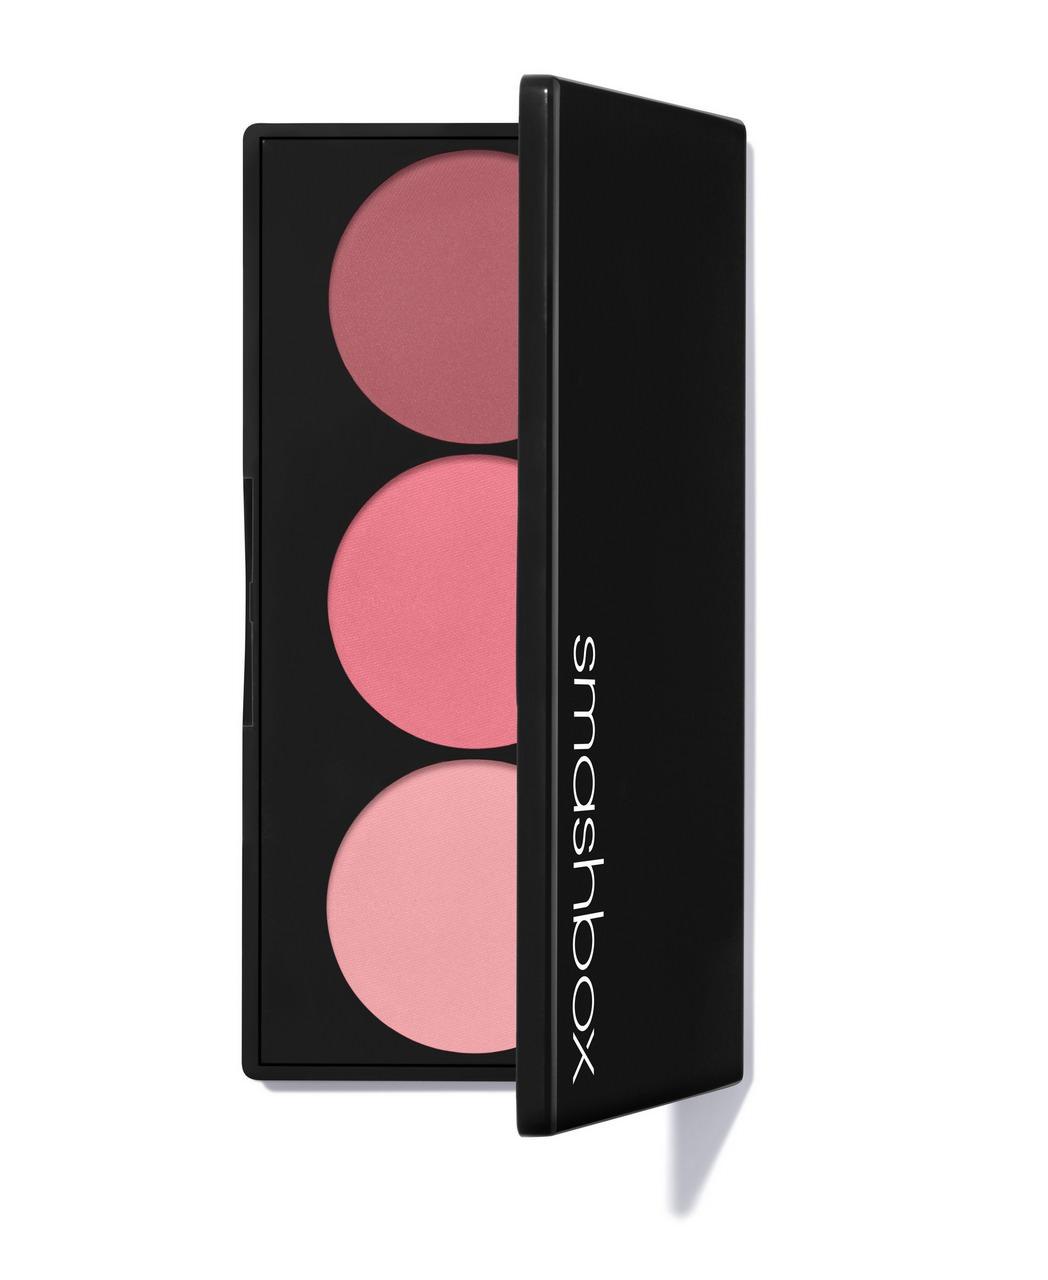 L.A Lights Blush & Highlight Palette 3 Malibu Berry